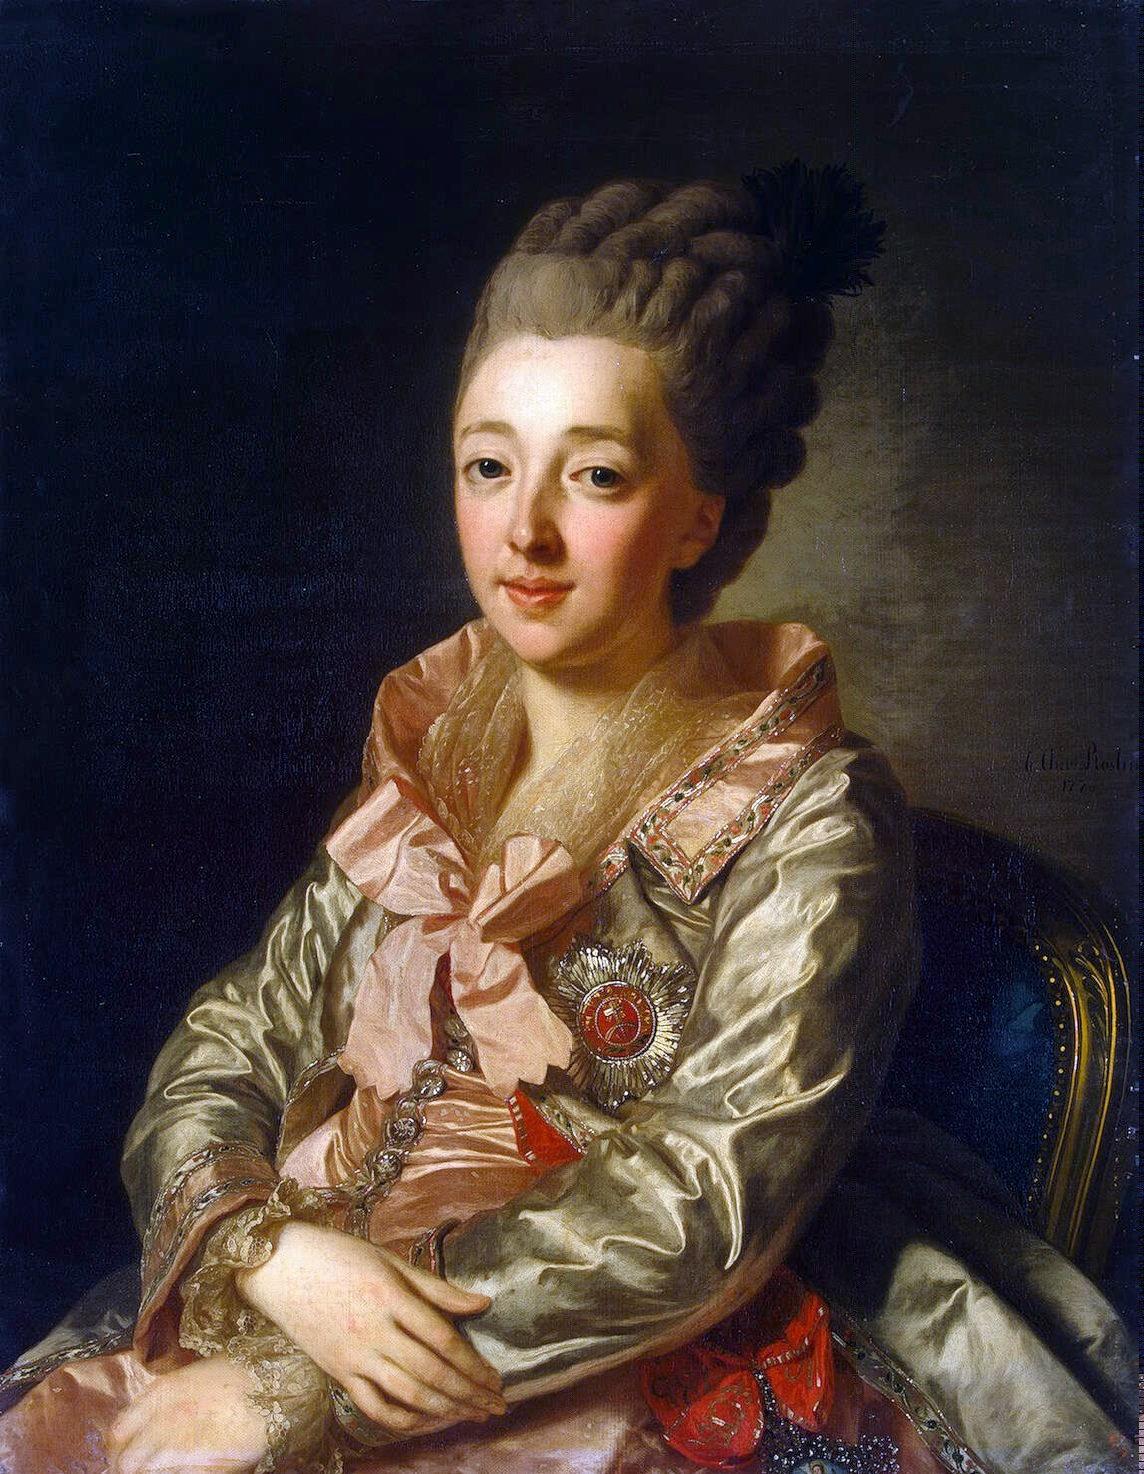 Alexander_Roslin_-_Portrait_of_Grand_Duchess_Natalia_Alexeyevna_-_WGA20066